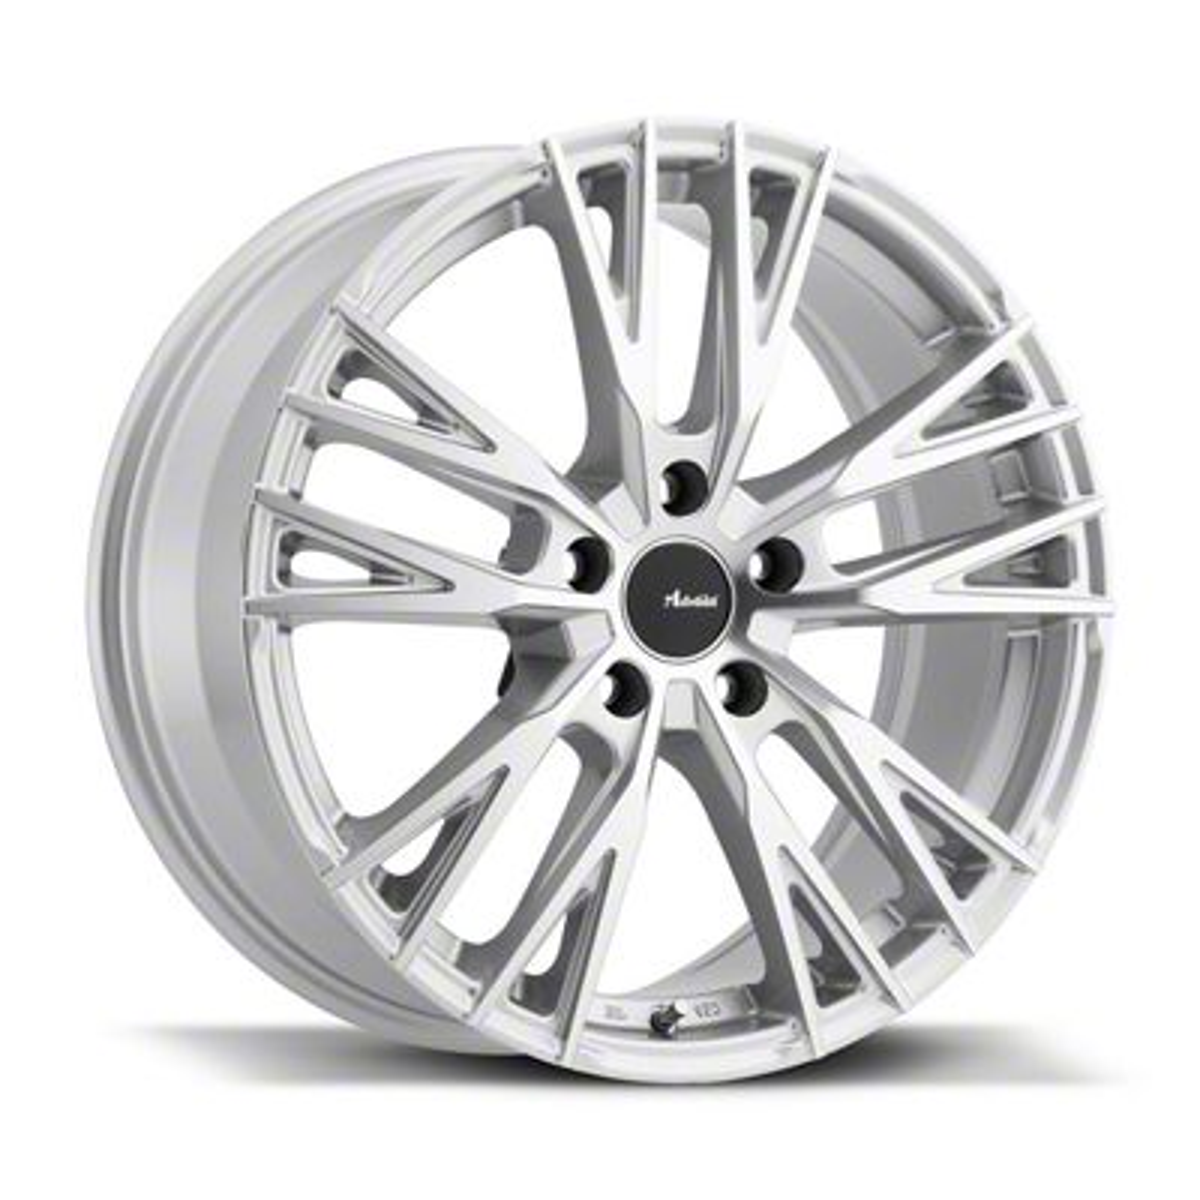 Advanti Forchette Silver w/ Machined Face Wheel - 20x8.5 (05-14 Standard GT, V6)